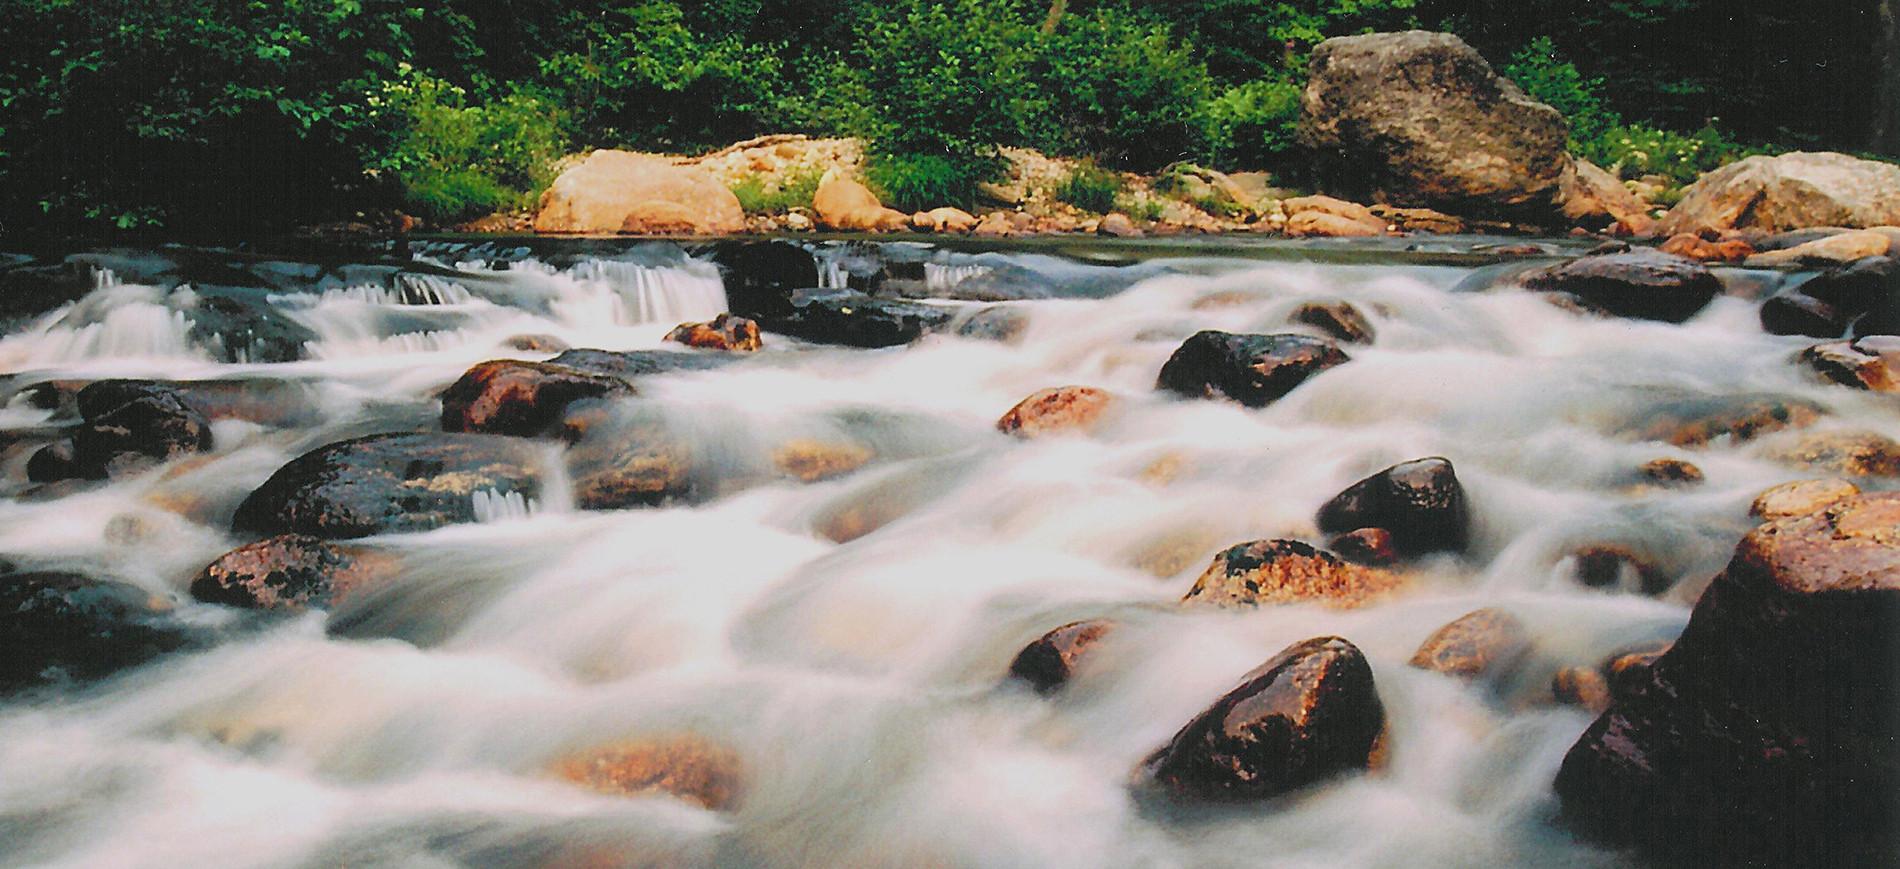 Ellis RiverNH Rapids